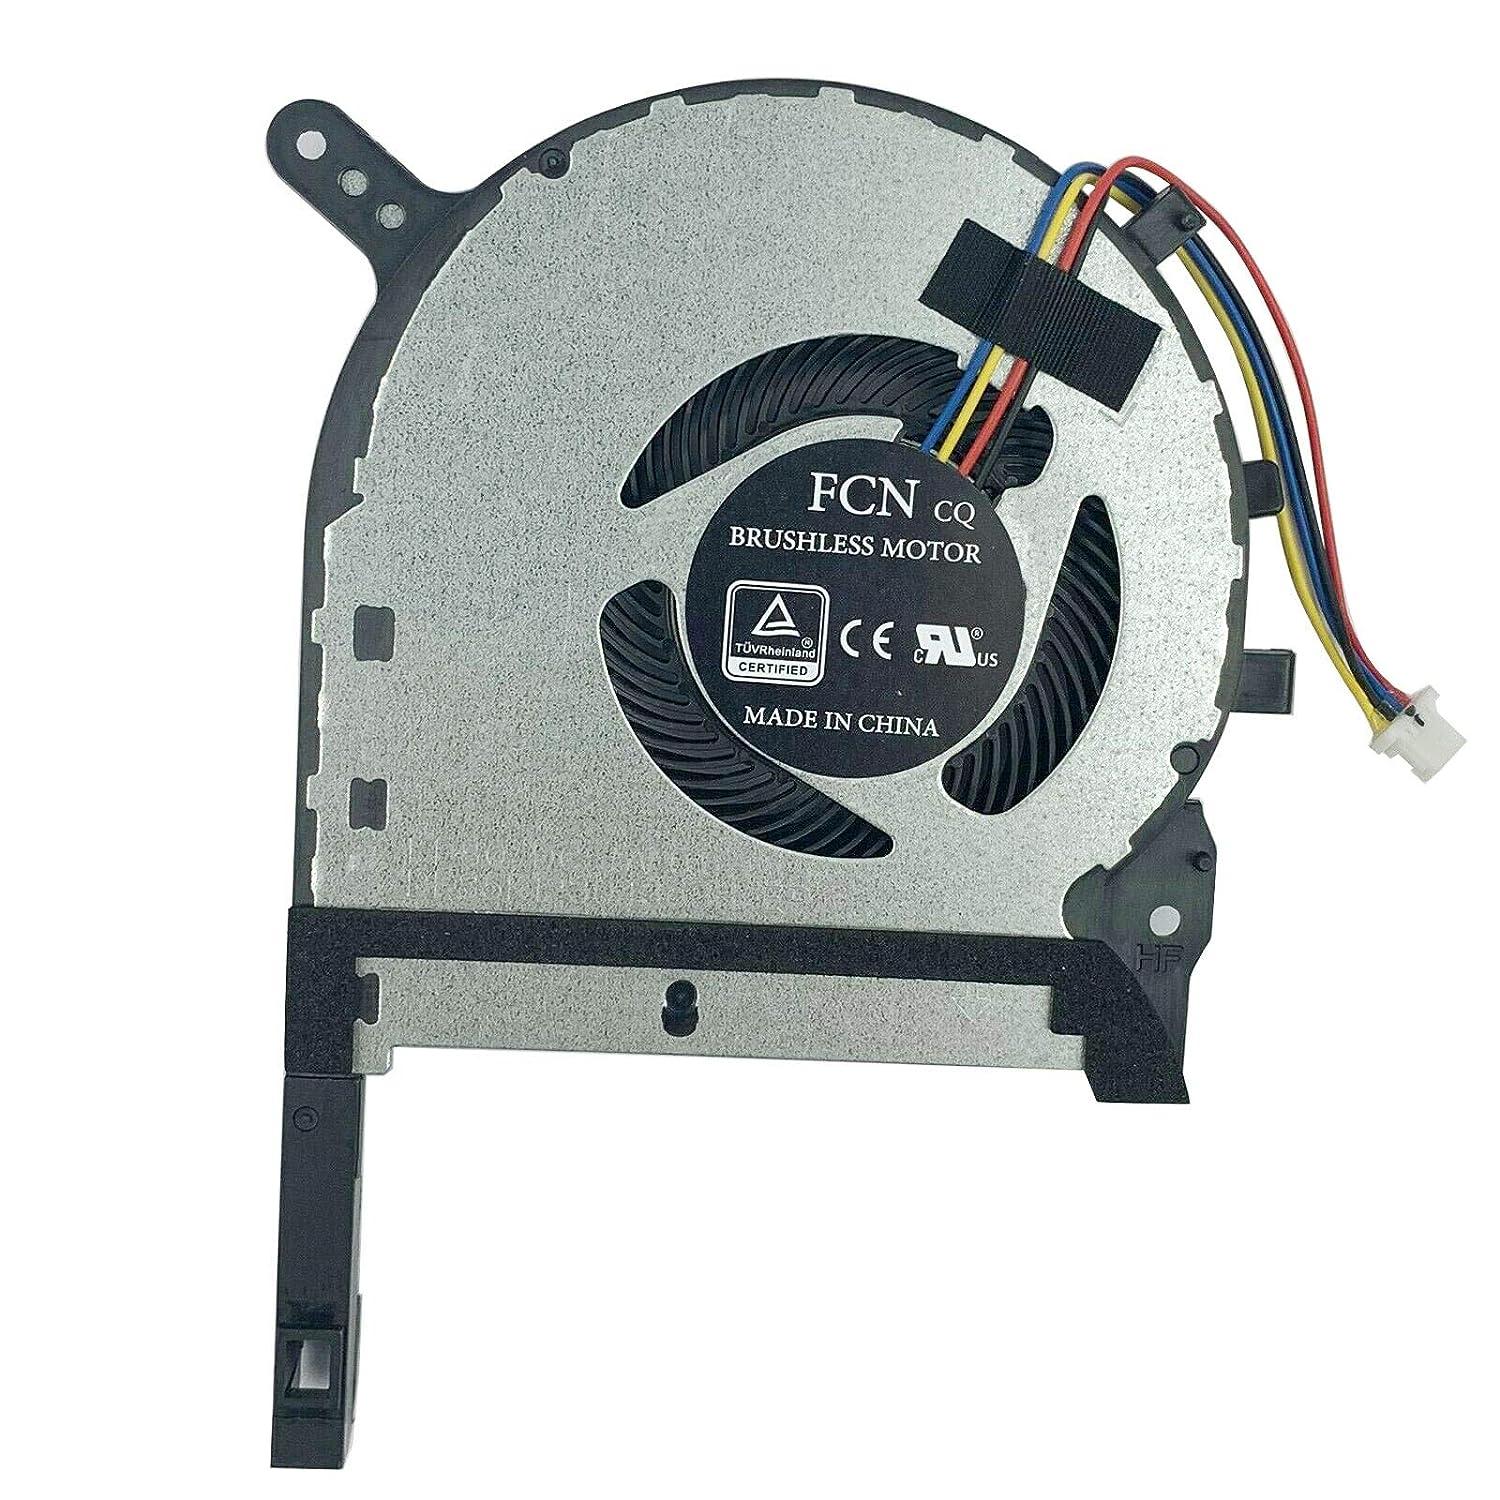 Laptop CPU Cooling Fan Compatible with HP Elitebook 745 G2 750 G2 755 G2, Elitebook 840 G2 850 G2 Series Laptop P/N: 730792-001